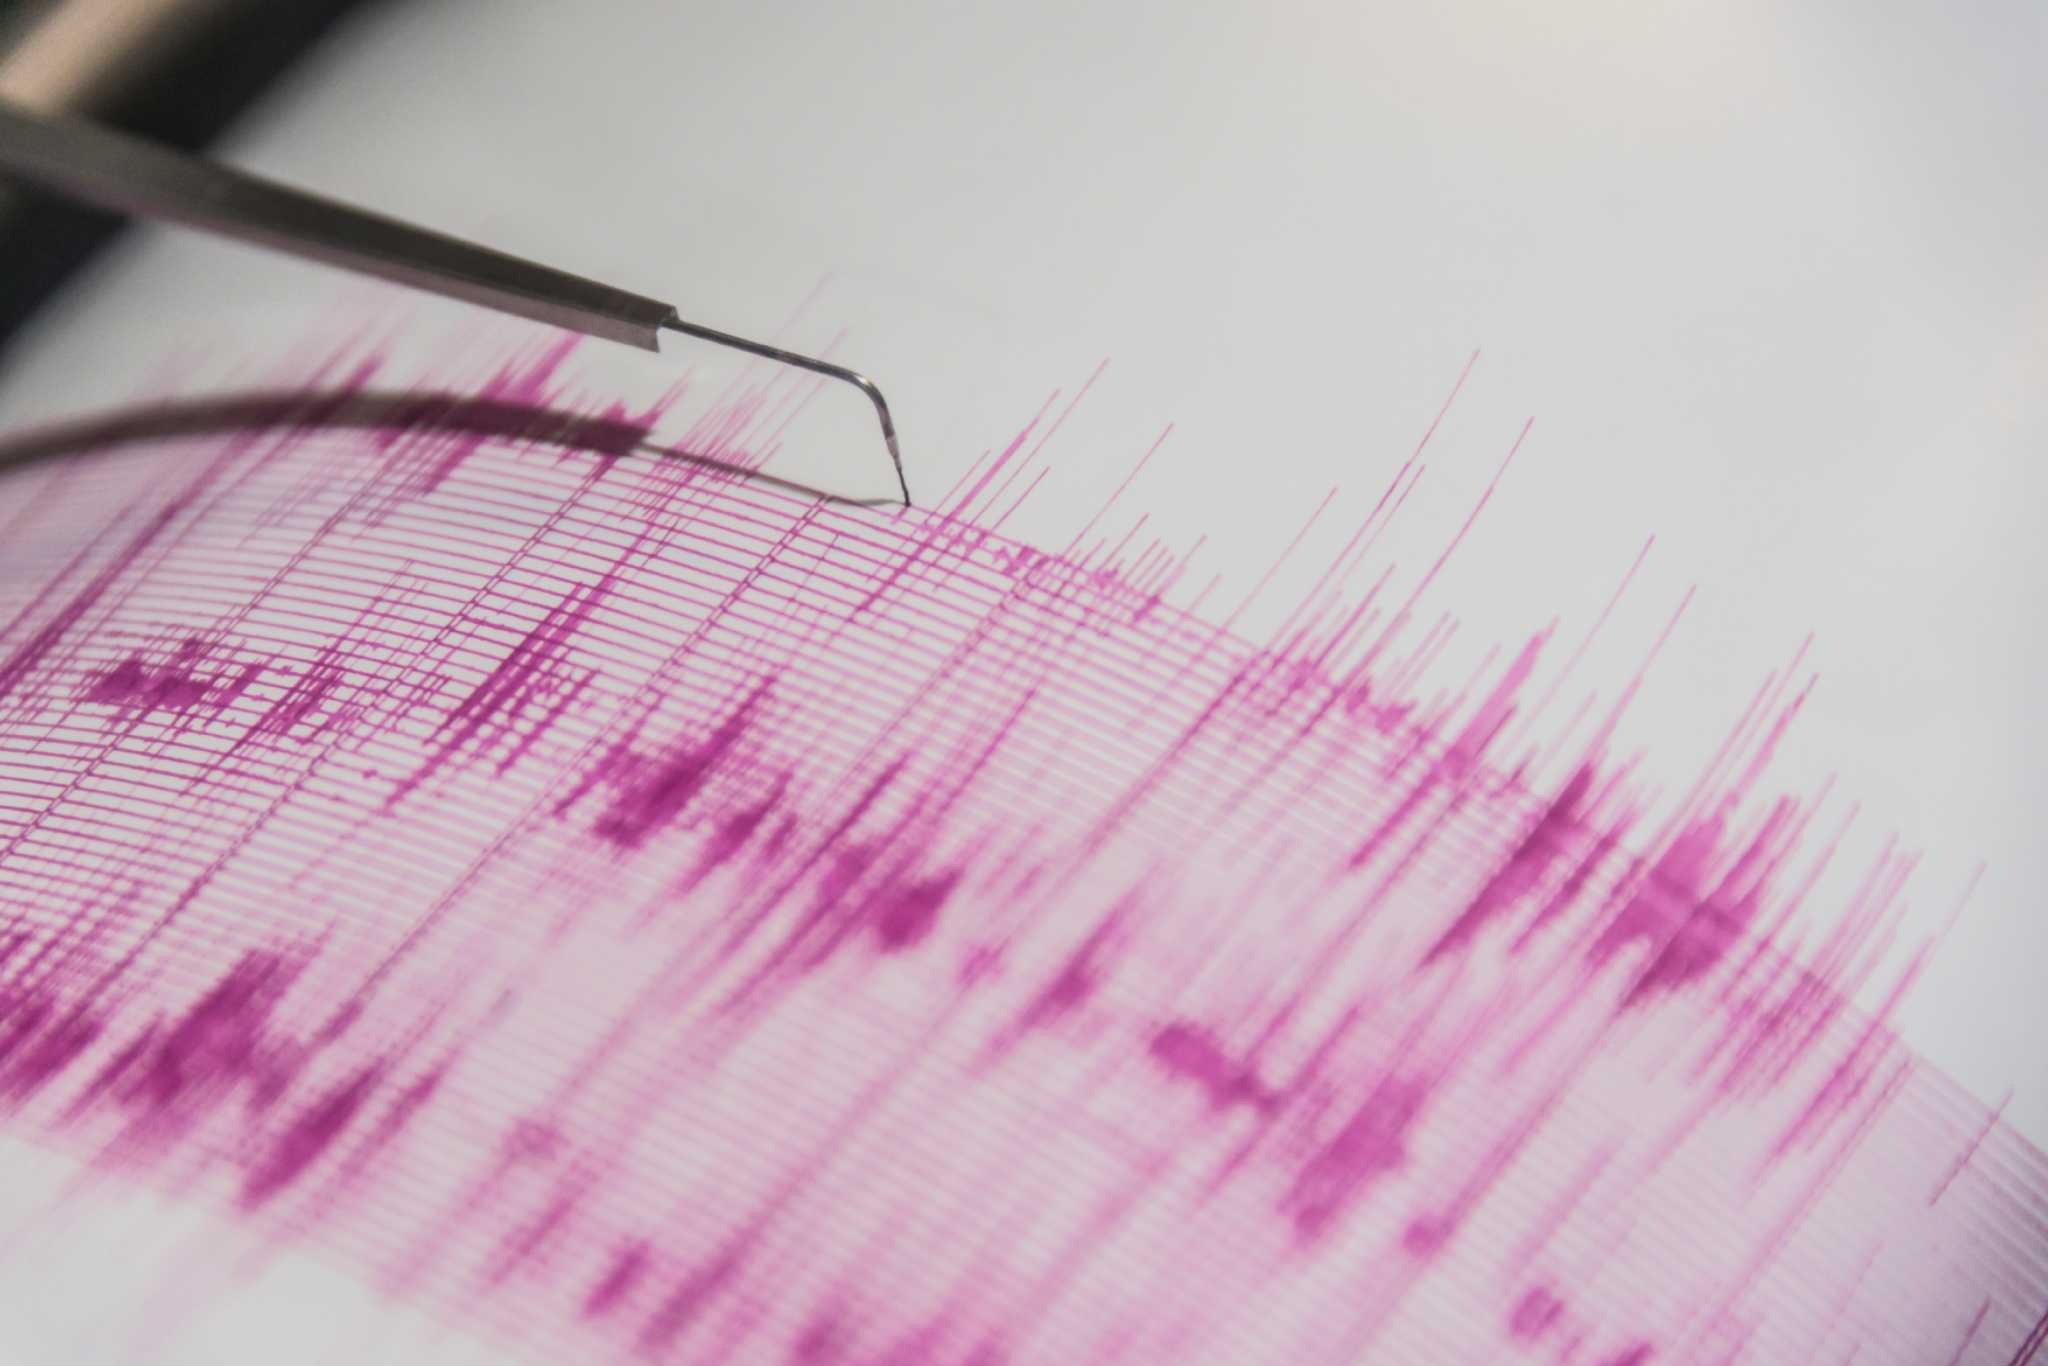 Magnitude 5.5 earthquake strikes near Searles Valley, CA